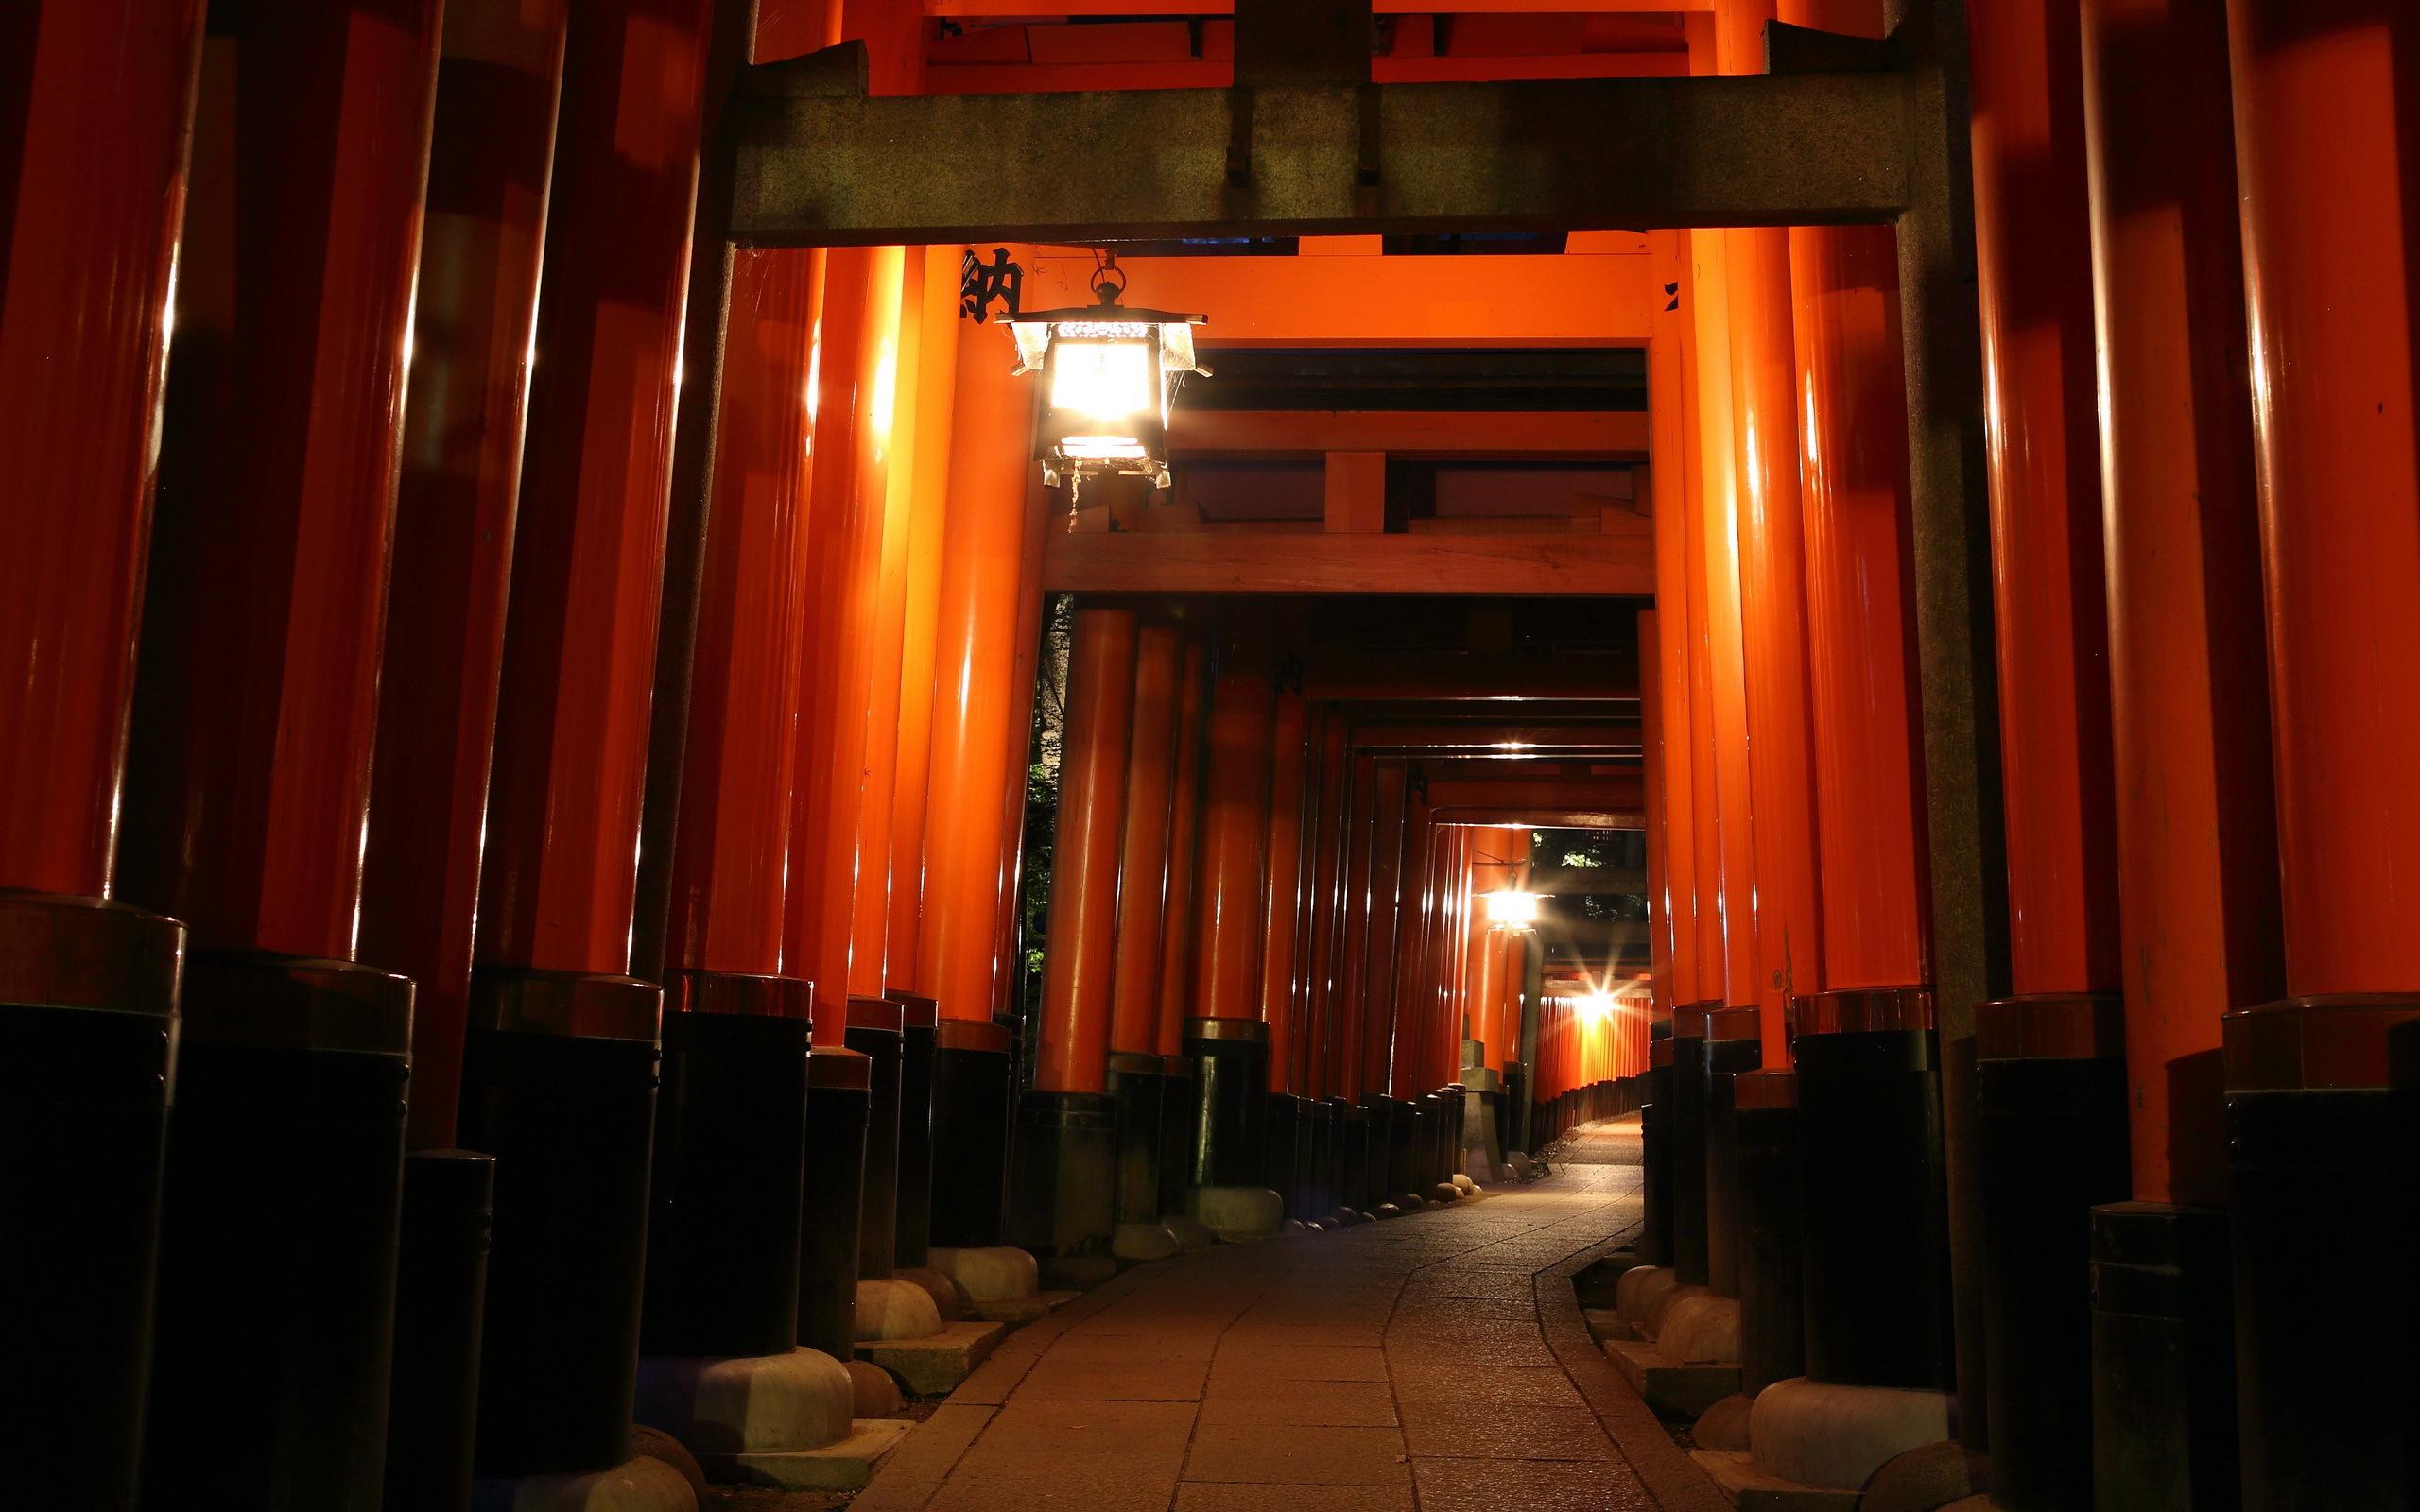 Fushimi Inari Taisha HD Wallpaper Background Image 2560x1600 2560x1600